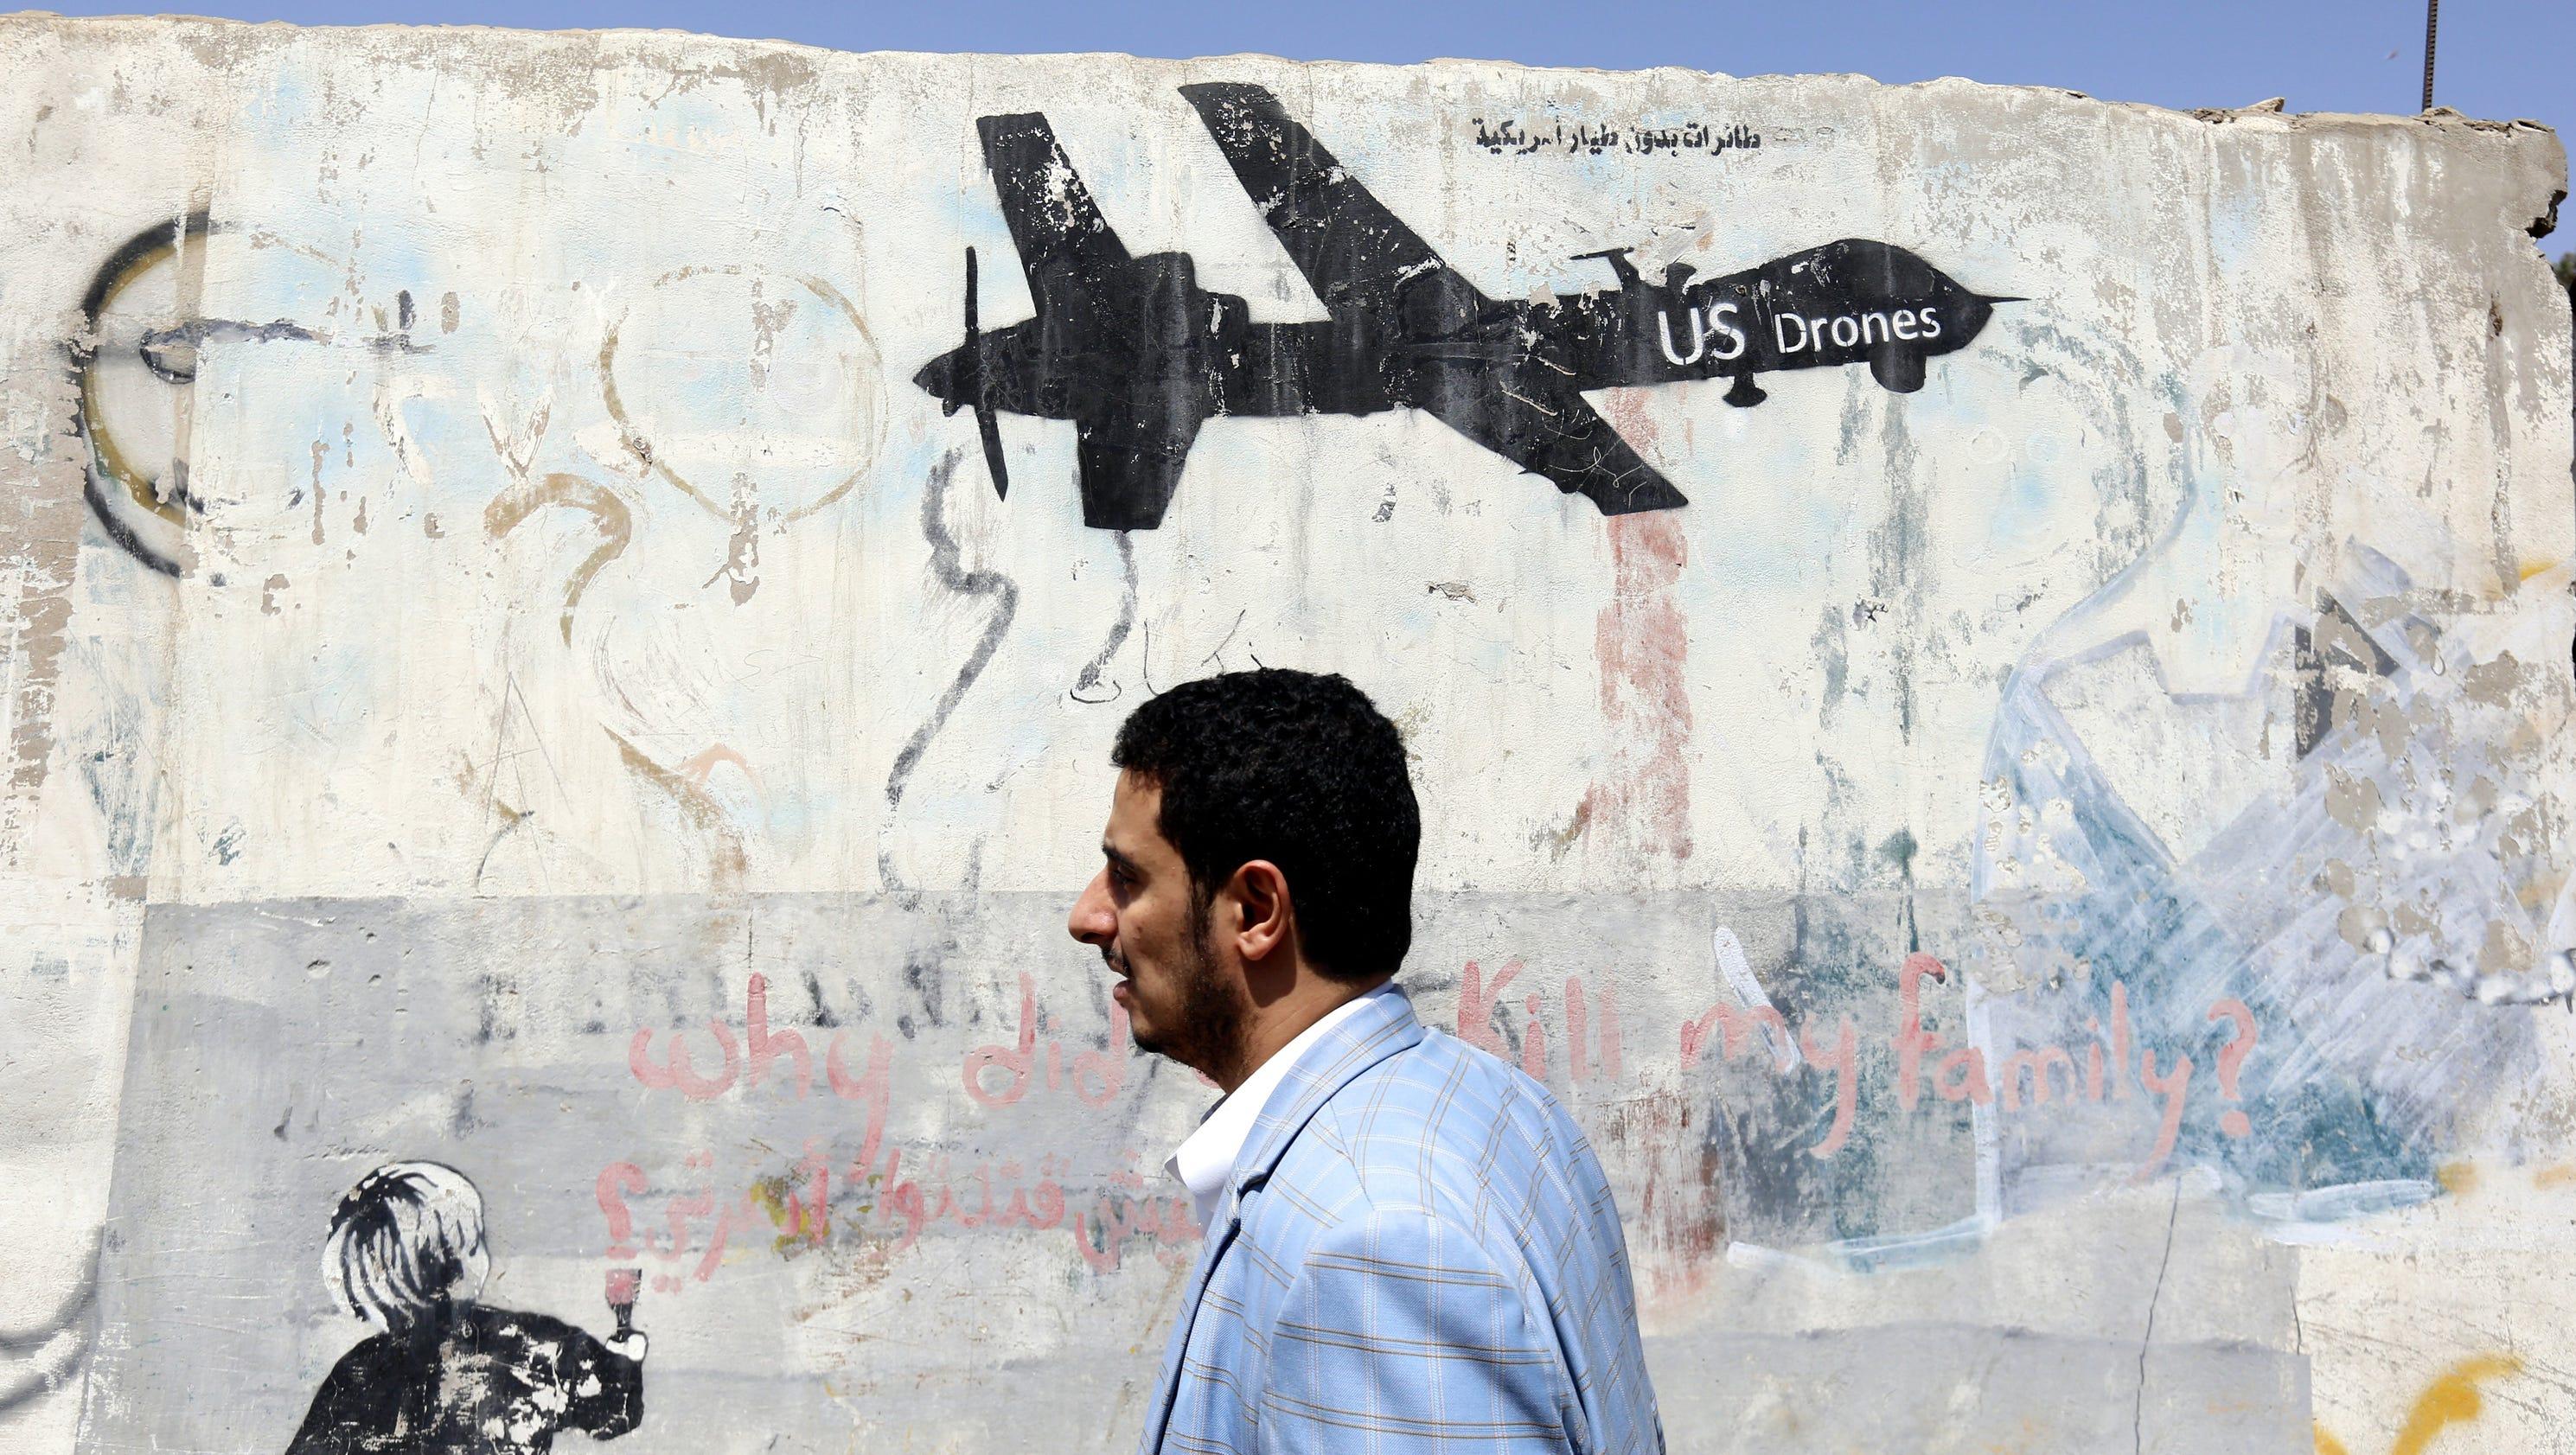 Yemen flights canceled after Saudis intercept ballistic missile